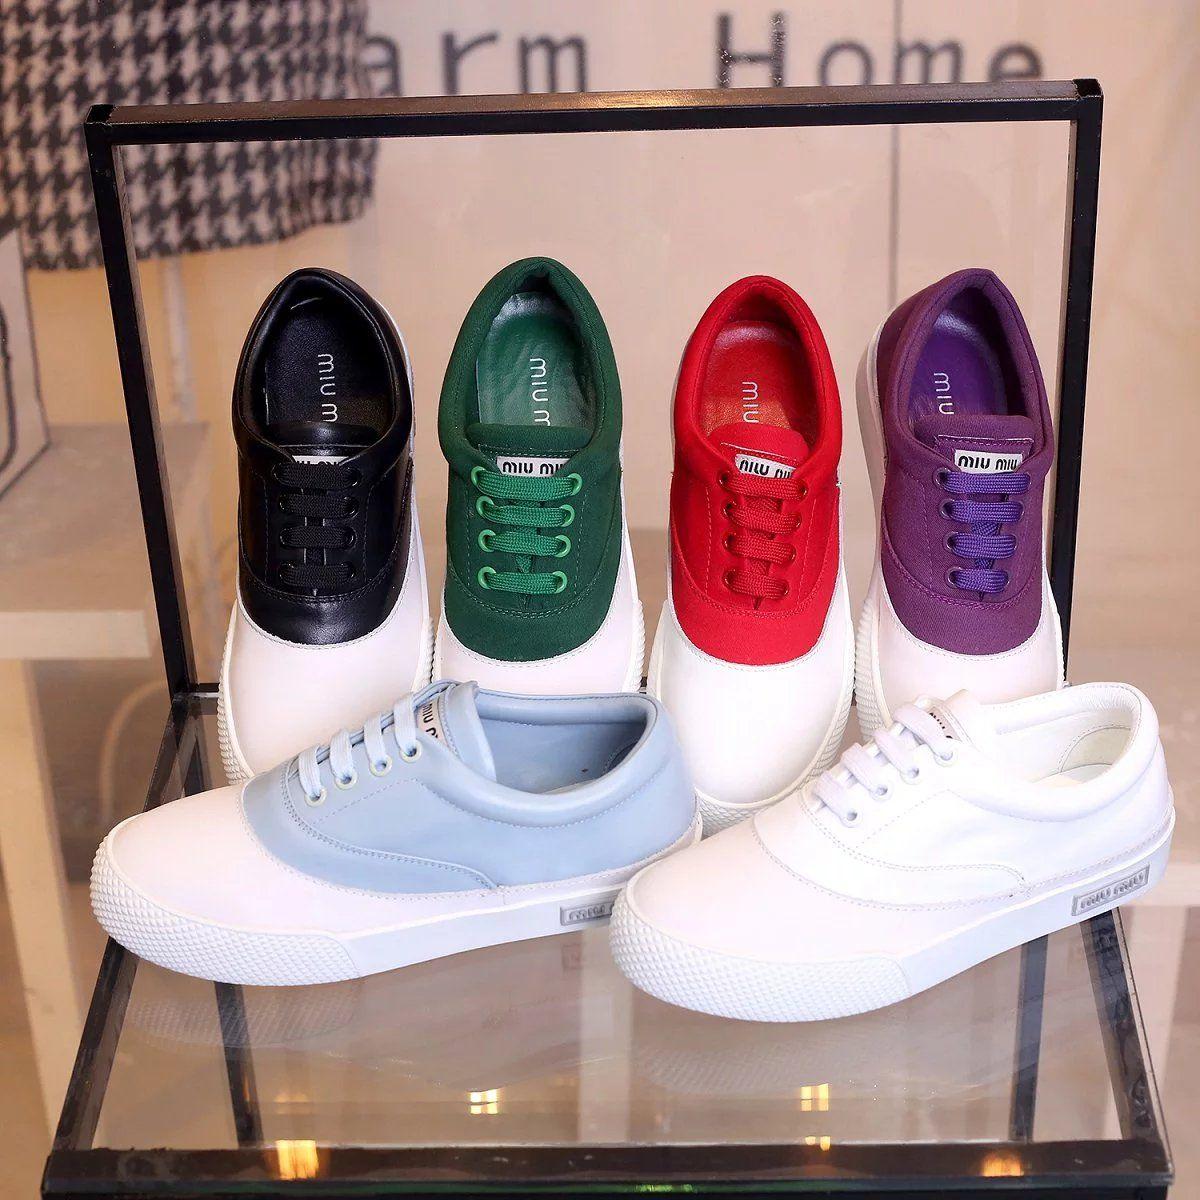 encontrar mano de obra duradero en uso producto caliente Pin on Fashion Brand Women Shoes